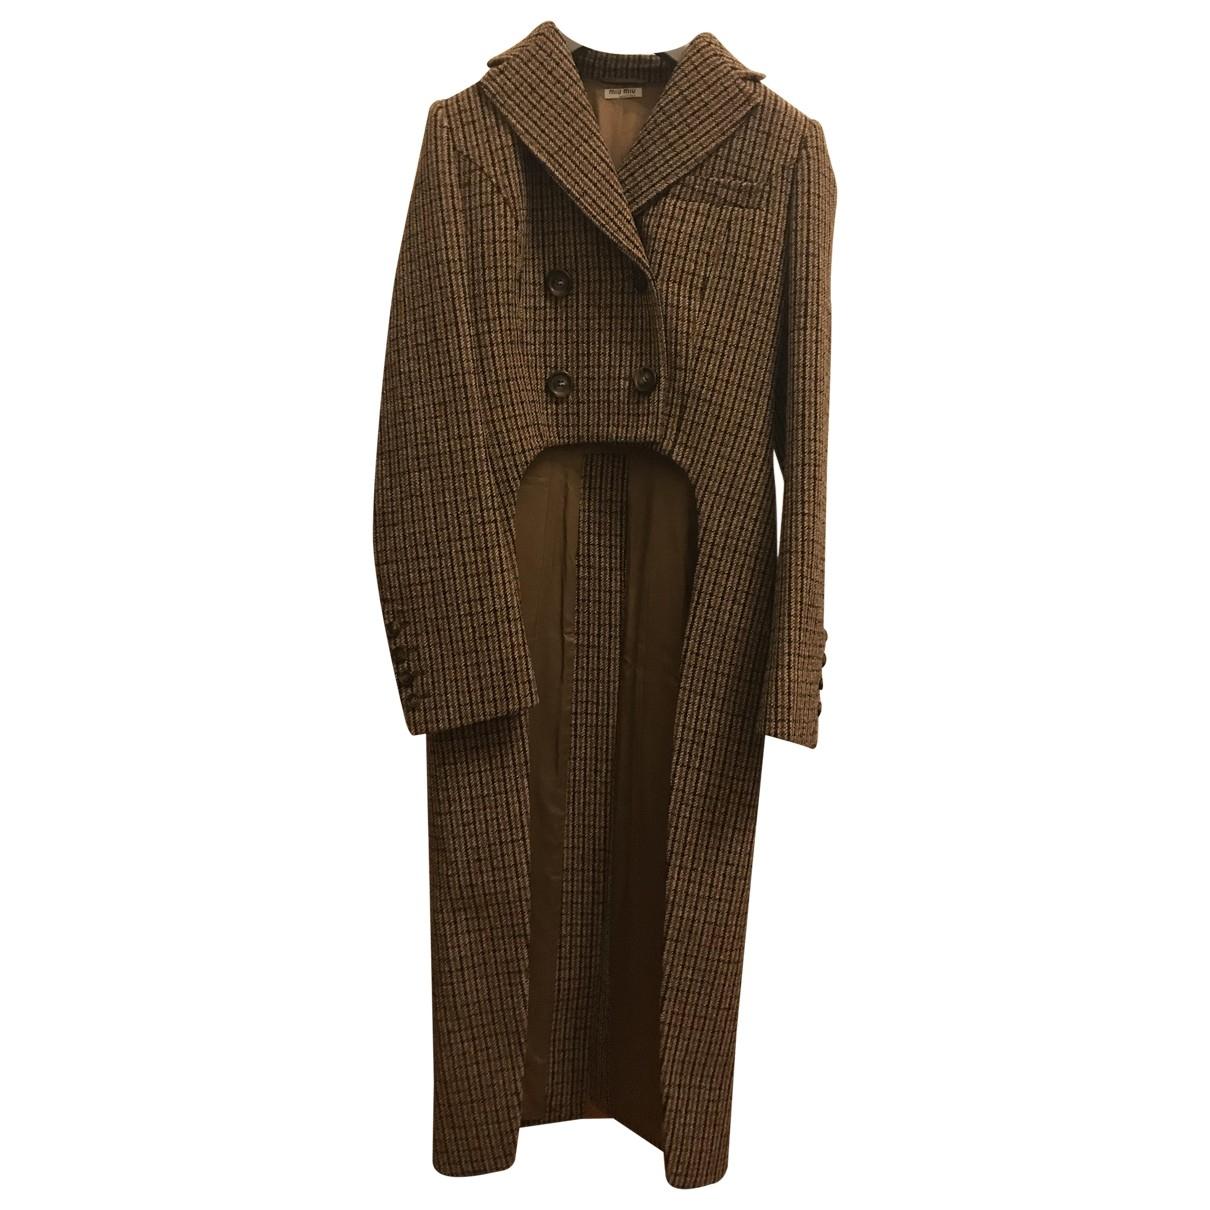 Miu Miu \N Wool coat for Women 38 IT